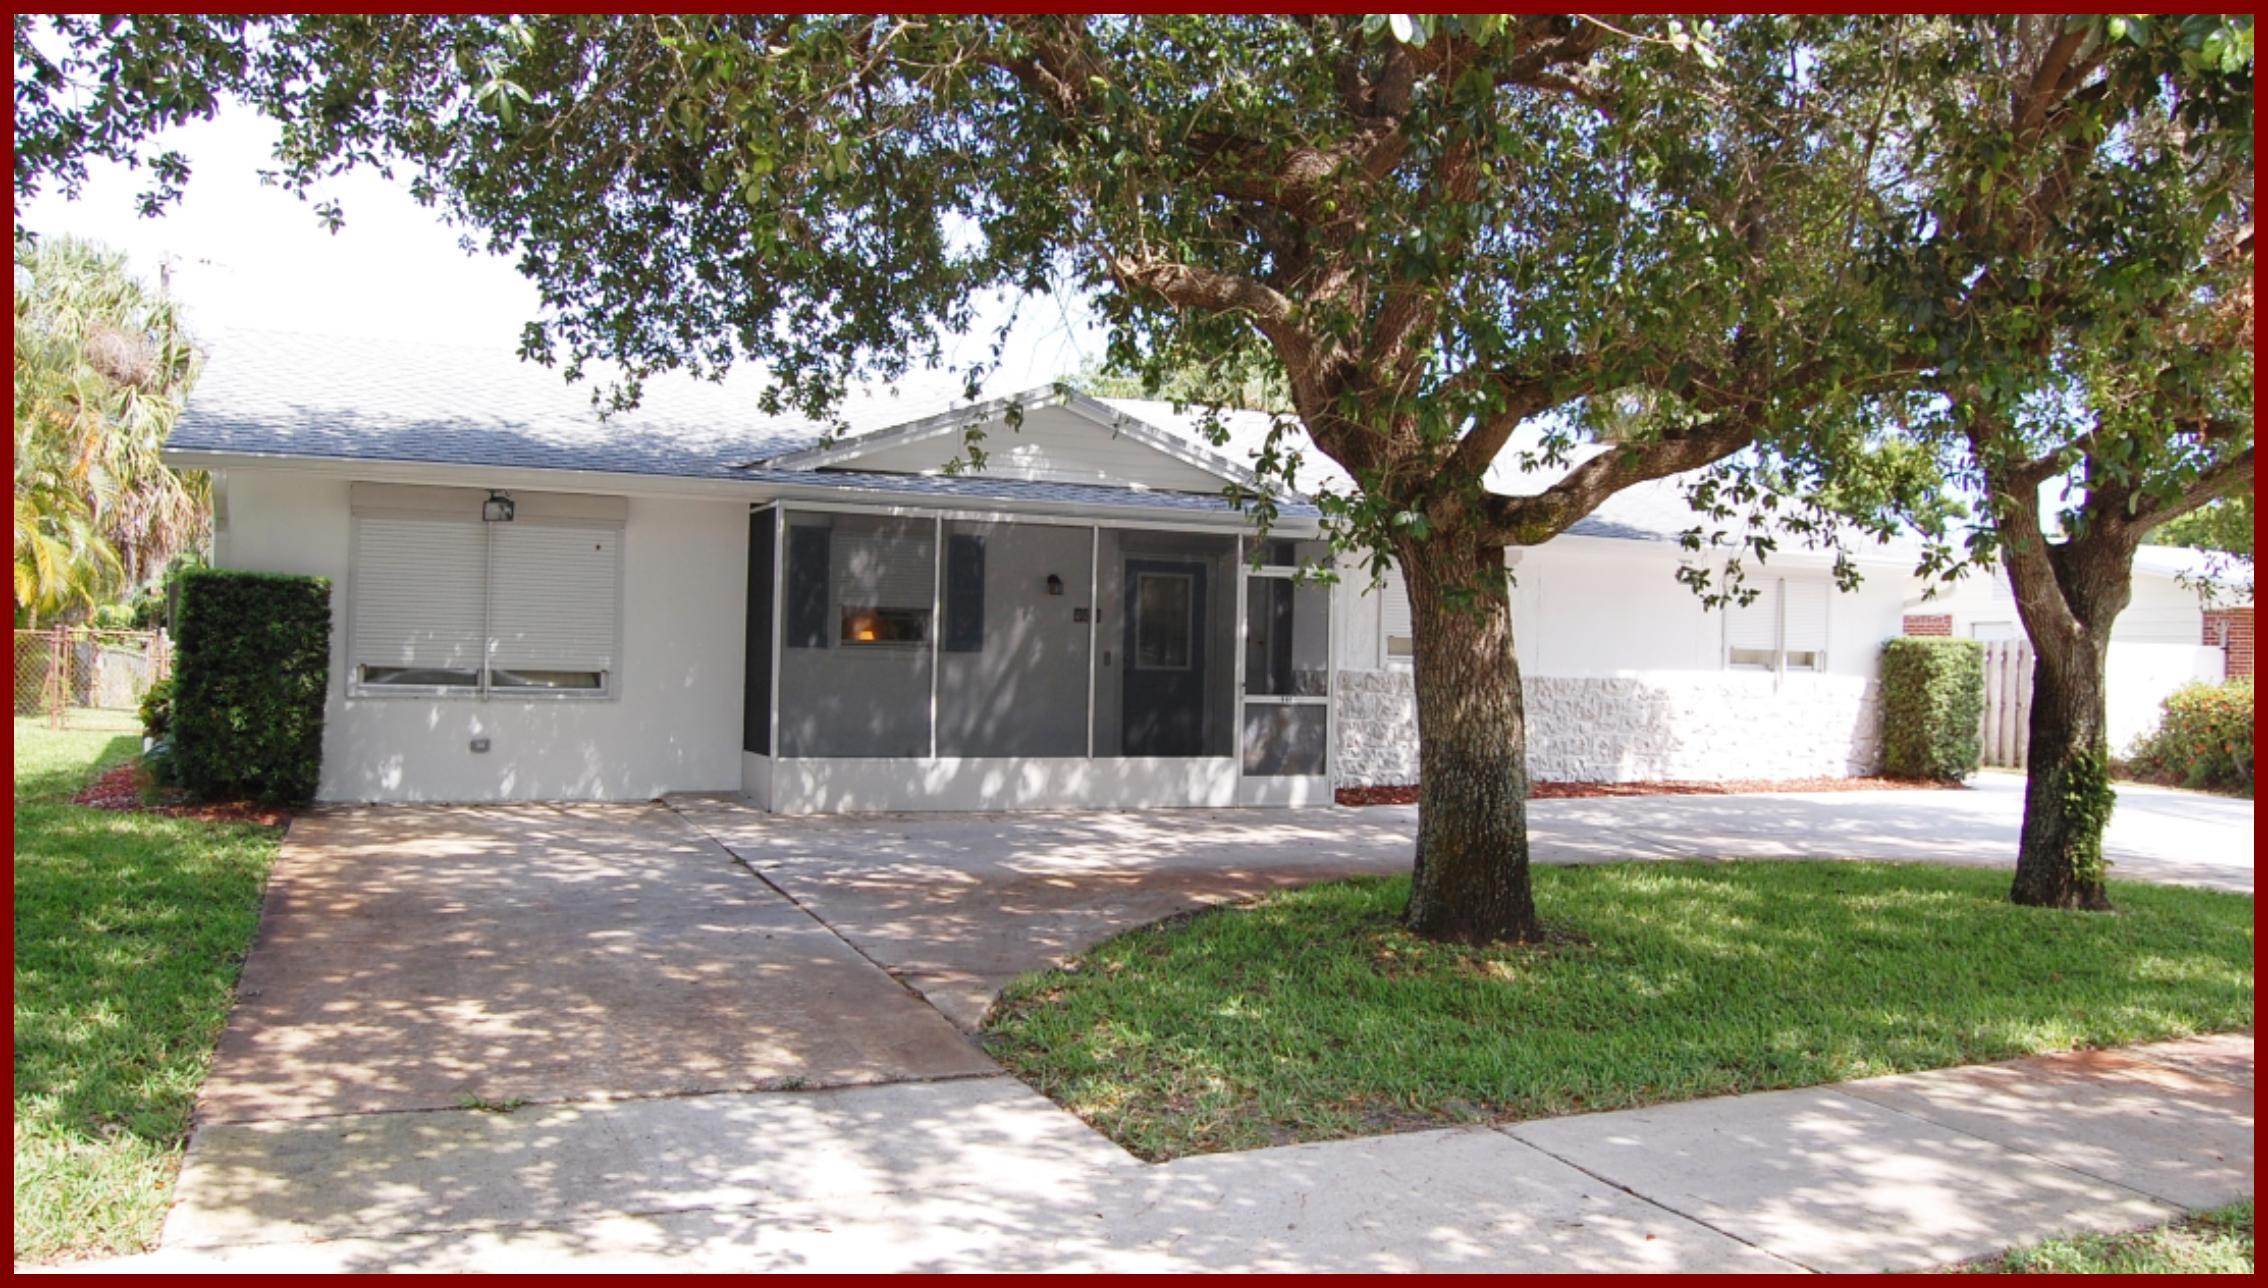 940 Prosperity Farms Road, North Palm Beach, Florida 33408, 3 Bedrooms Bedrooms, ,2 BathroomsBathrooms,A,Single family,Prosperity Farms,RX-10527128